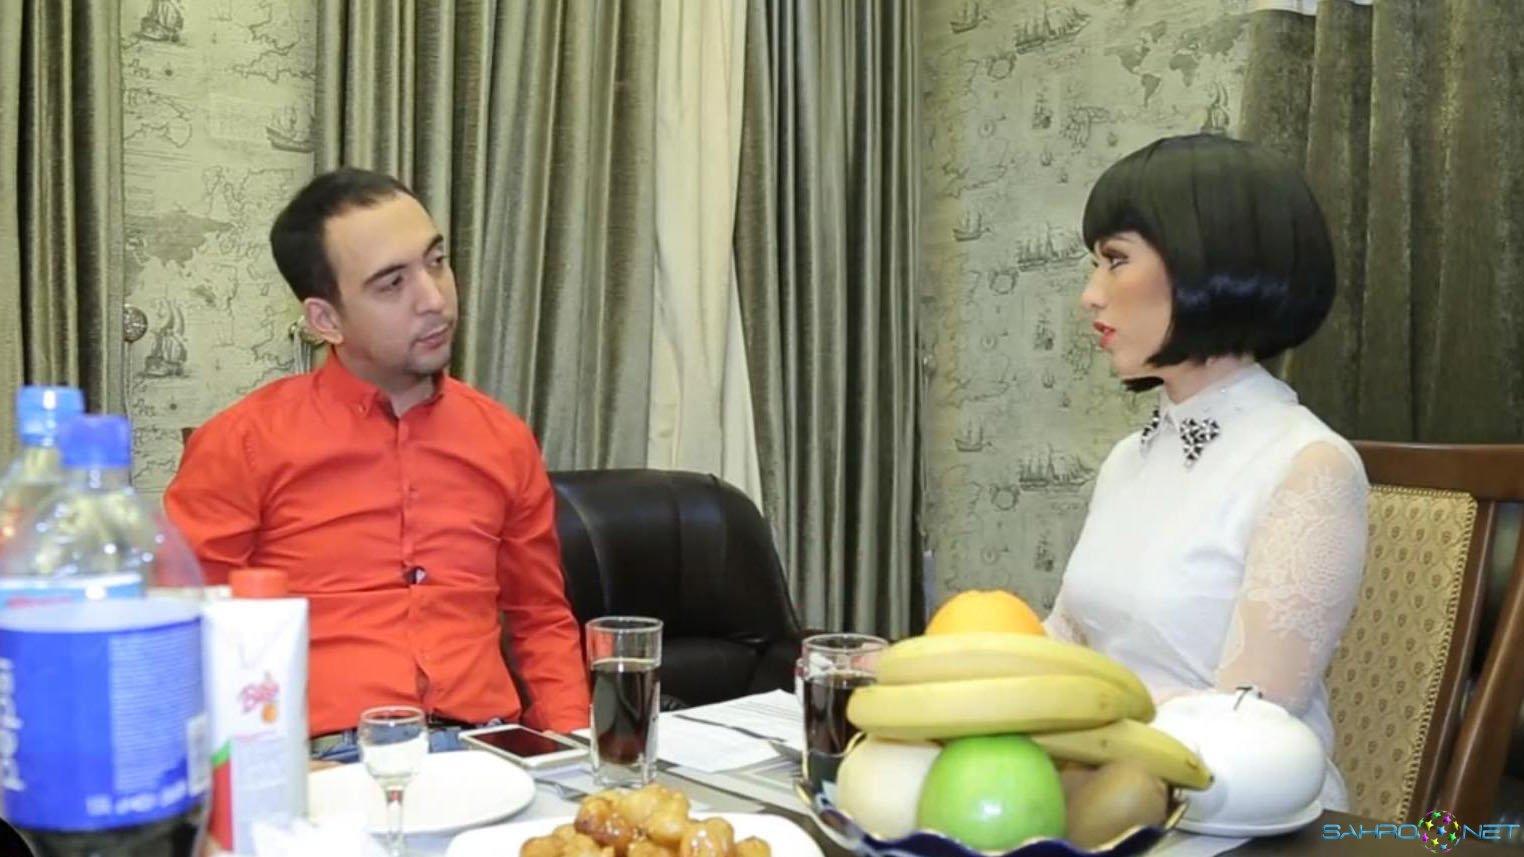 Asilbek Negmatov 2016 qo'shiq o'g'risi ekanligini tan oldi